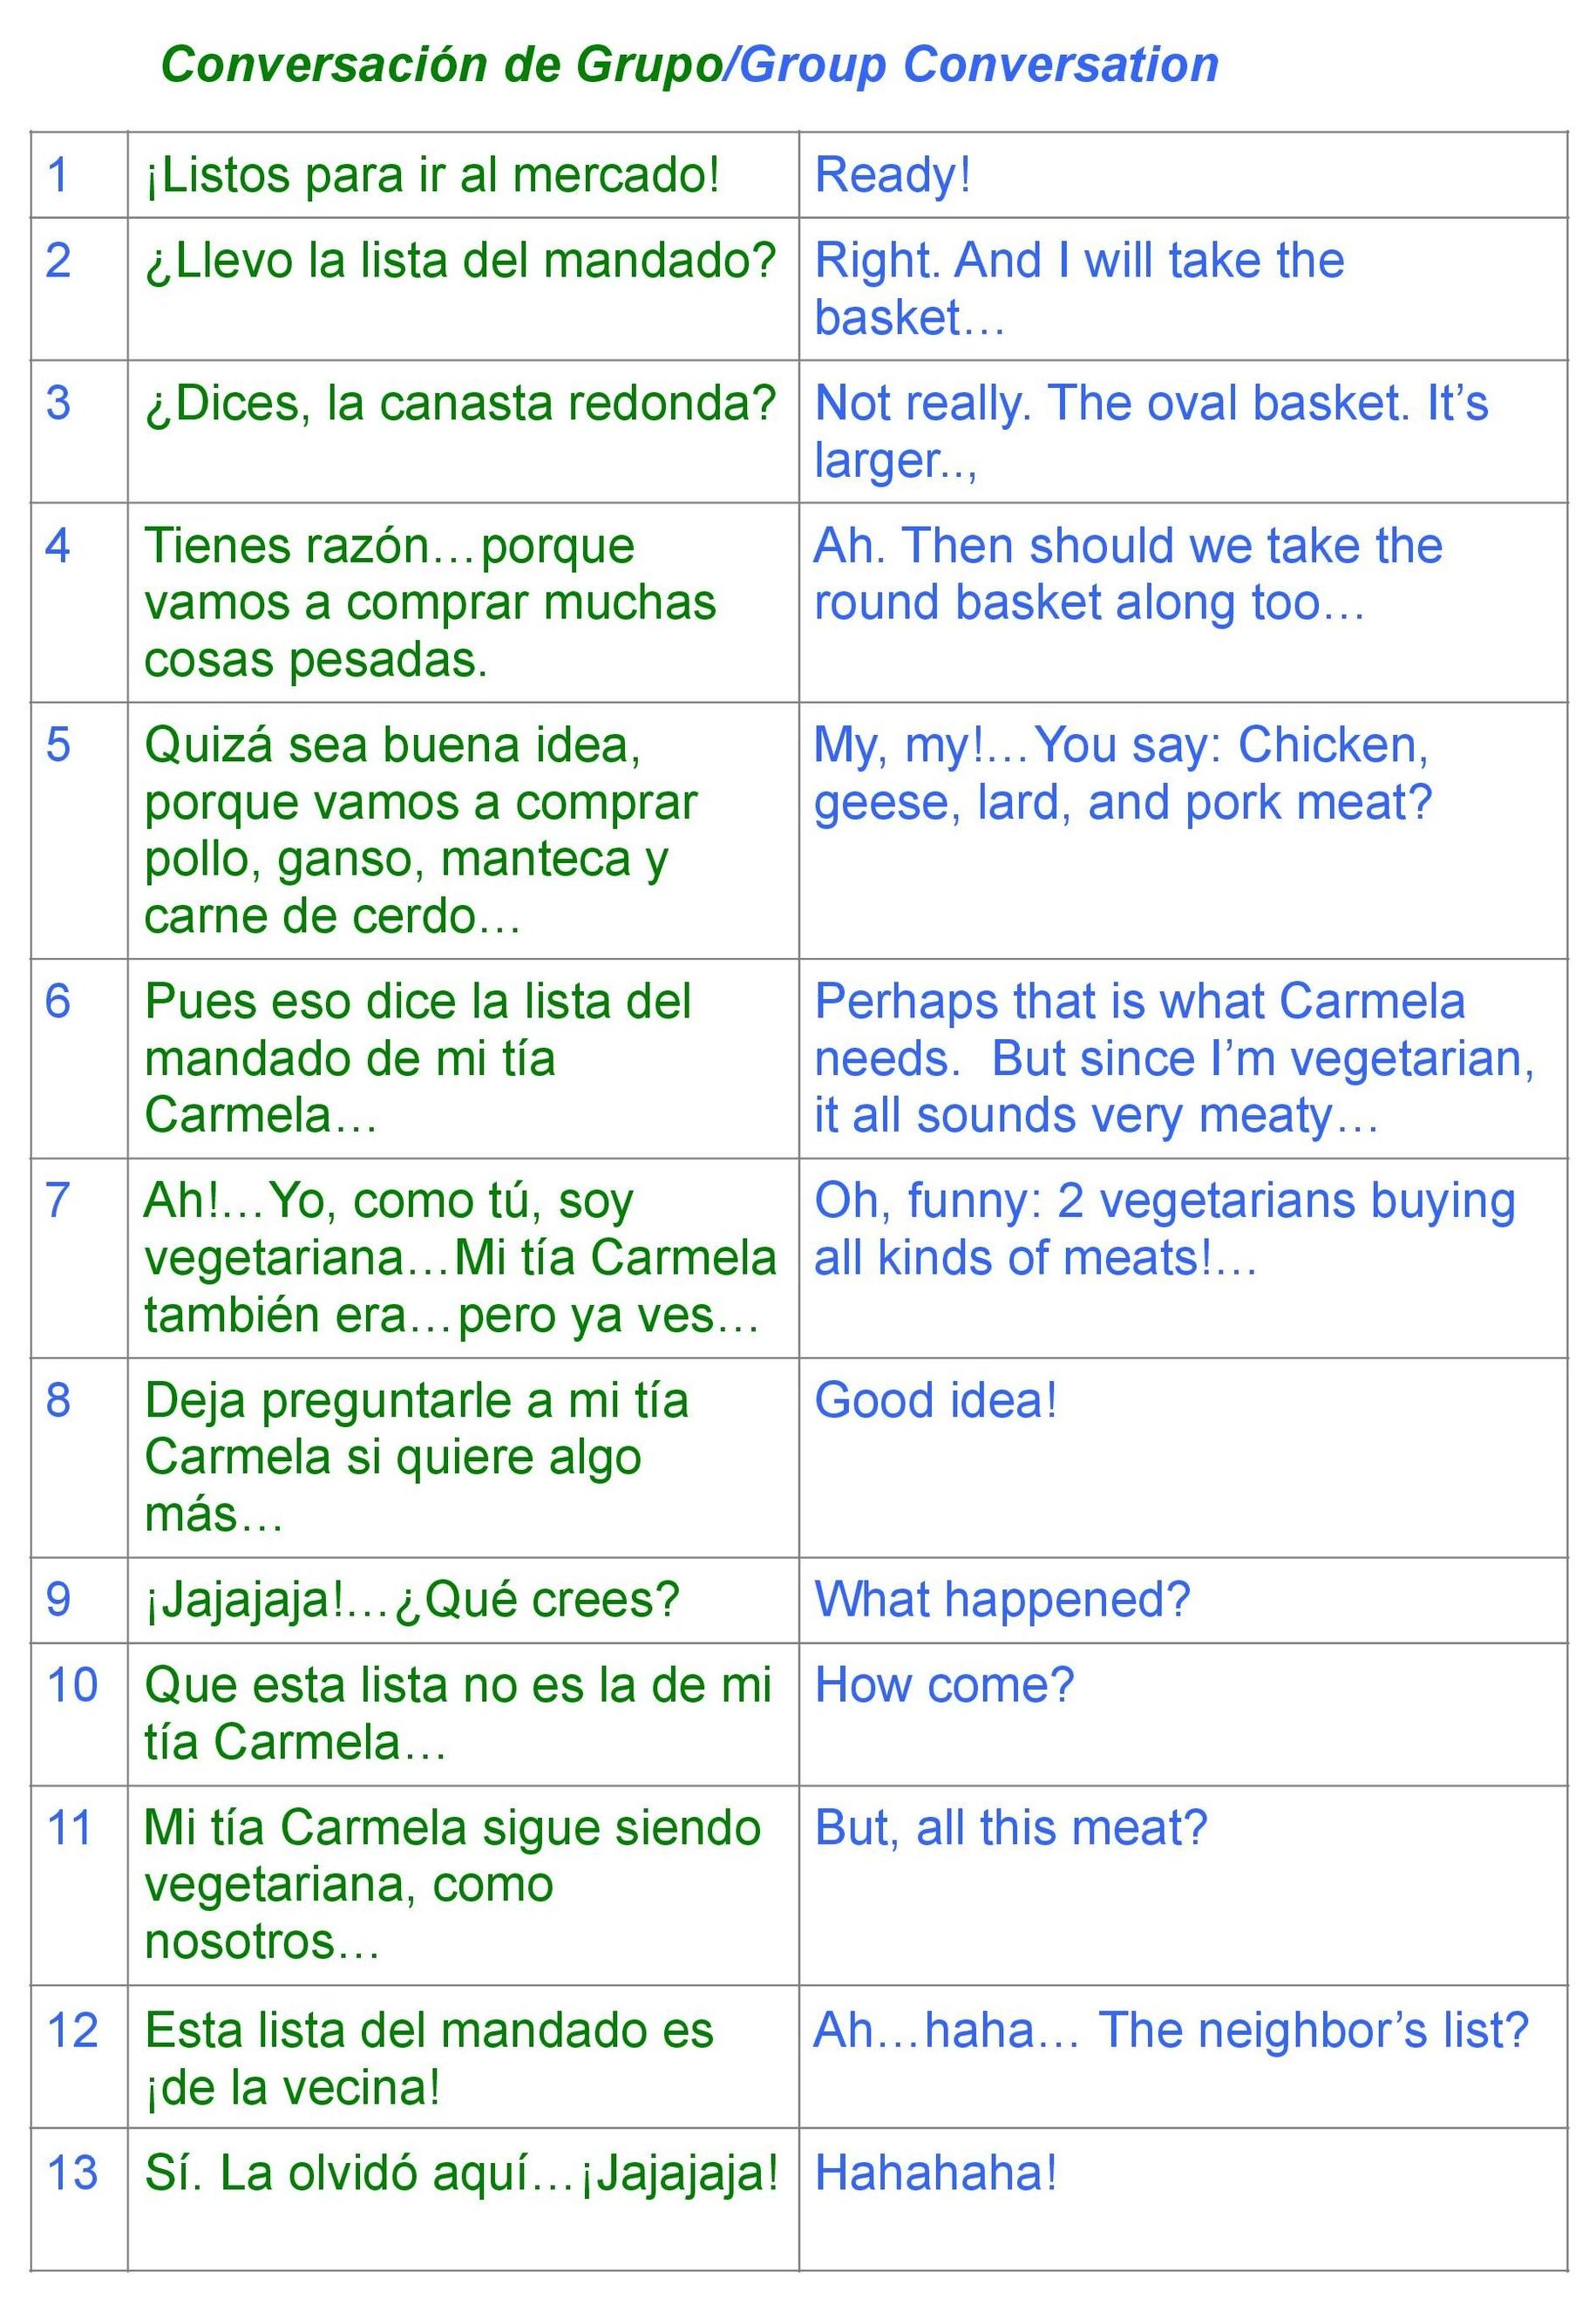 PB! Chapter 2.7 Conversation-1.jpg